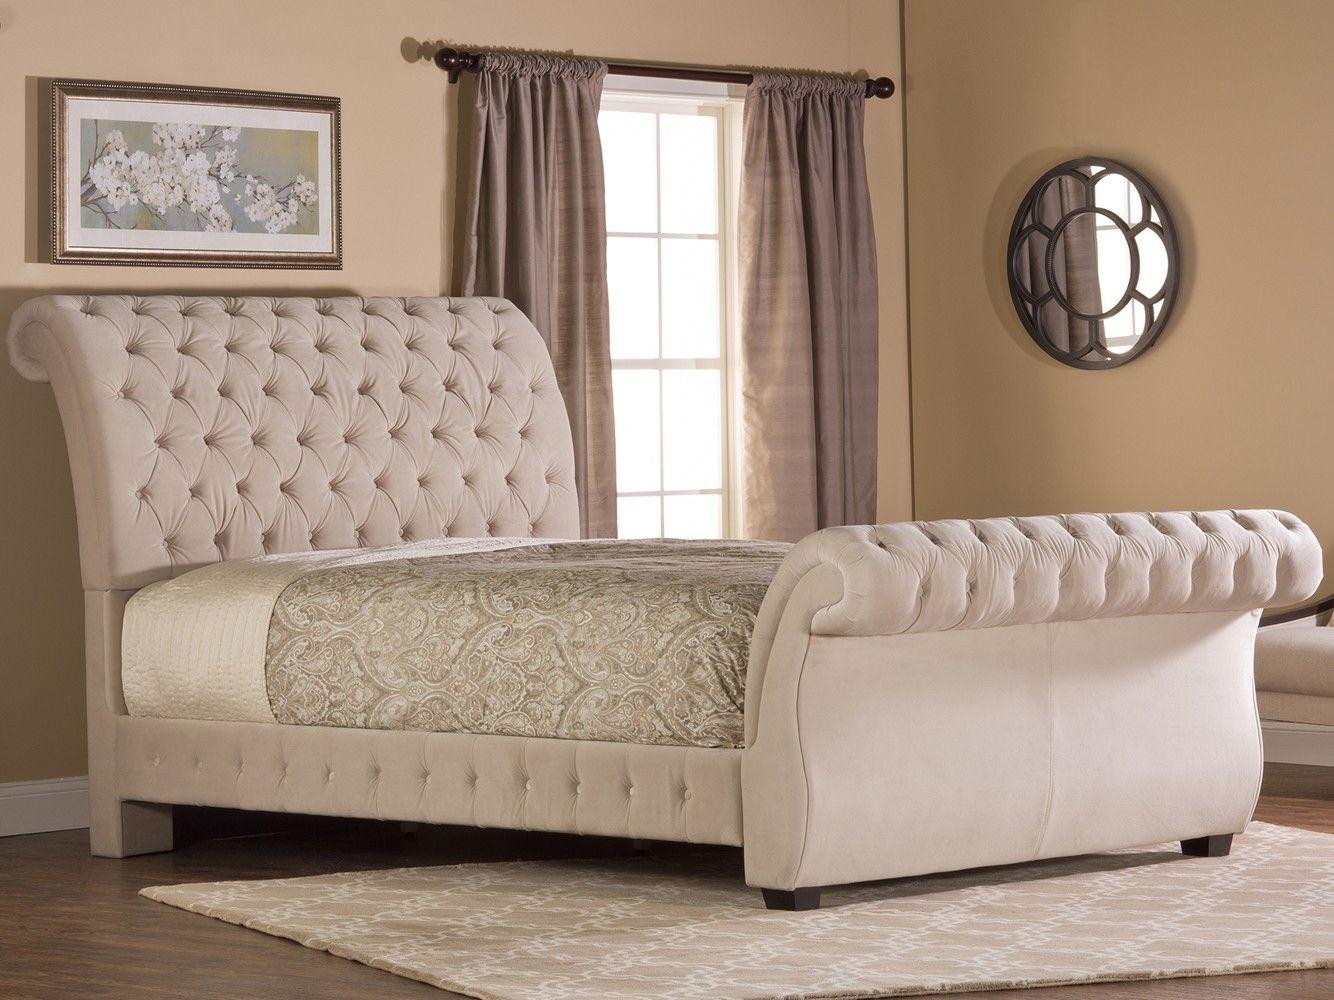 Wayfair Tufted Headboard Tufted Headboard In Bedroom: Bombay Fabric Upholstered Bed In Buckwheat By Hillsdale